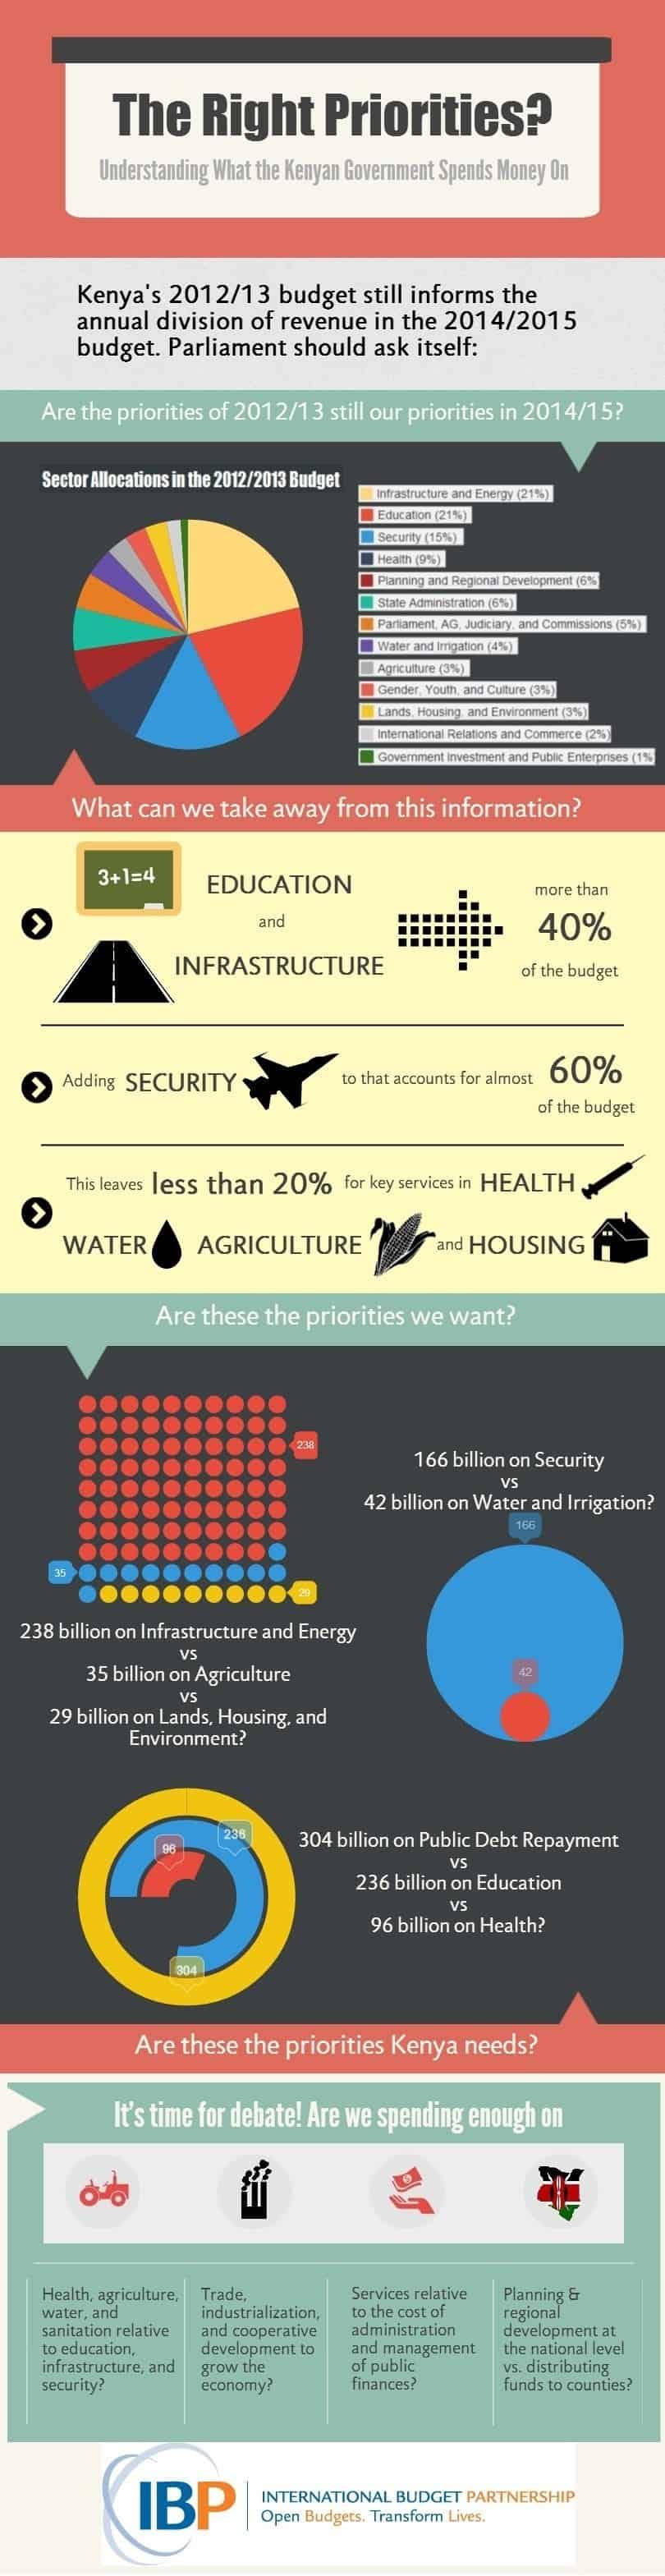 Kenya Divison of Revenue 2014-15 infographic